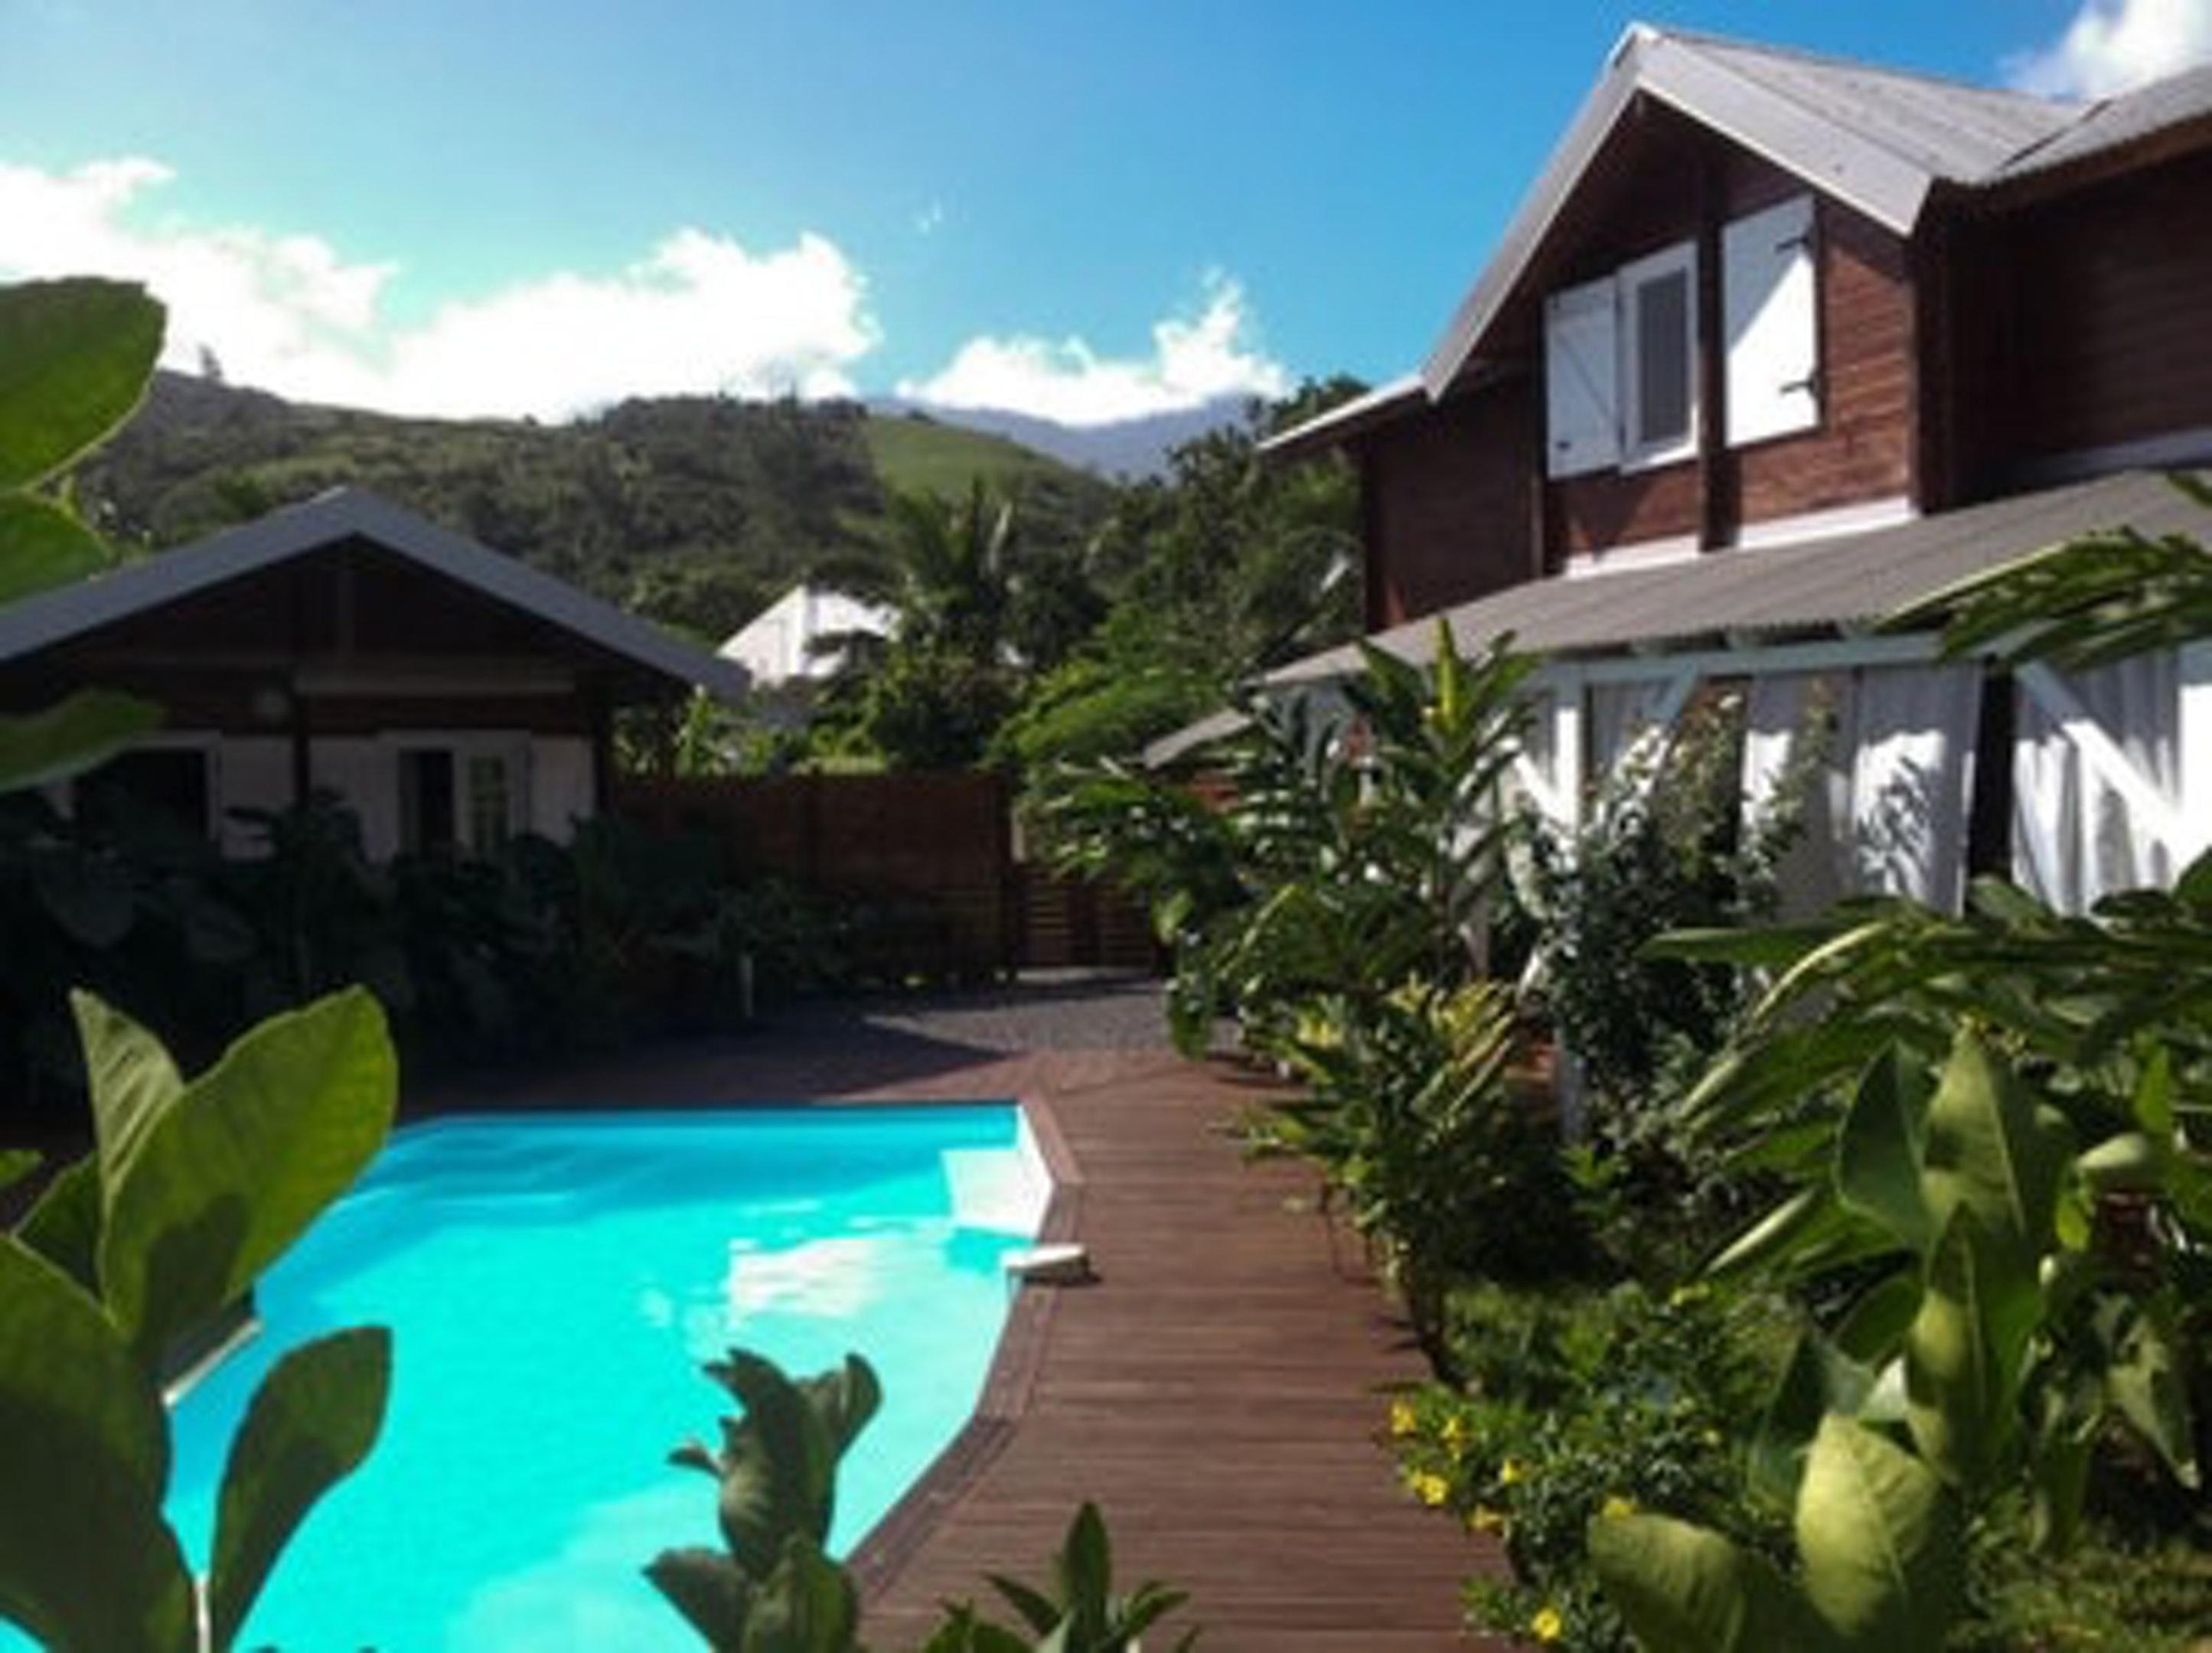 Bungalow mit 2 Schlafzimmern in Vincendo, Saint-Jo Bungalow in Afrika